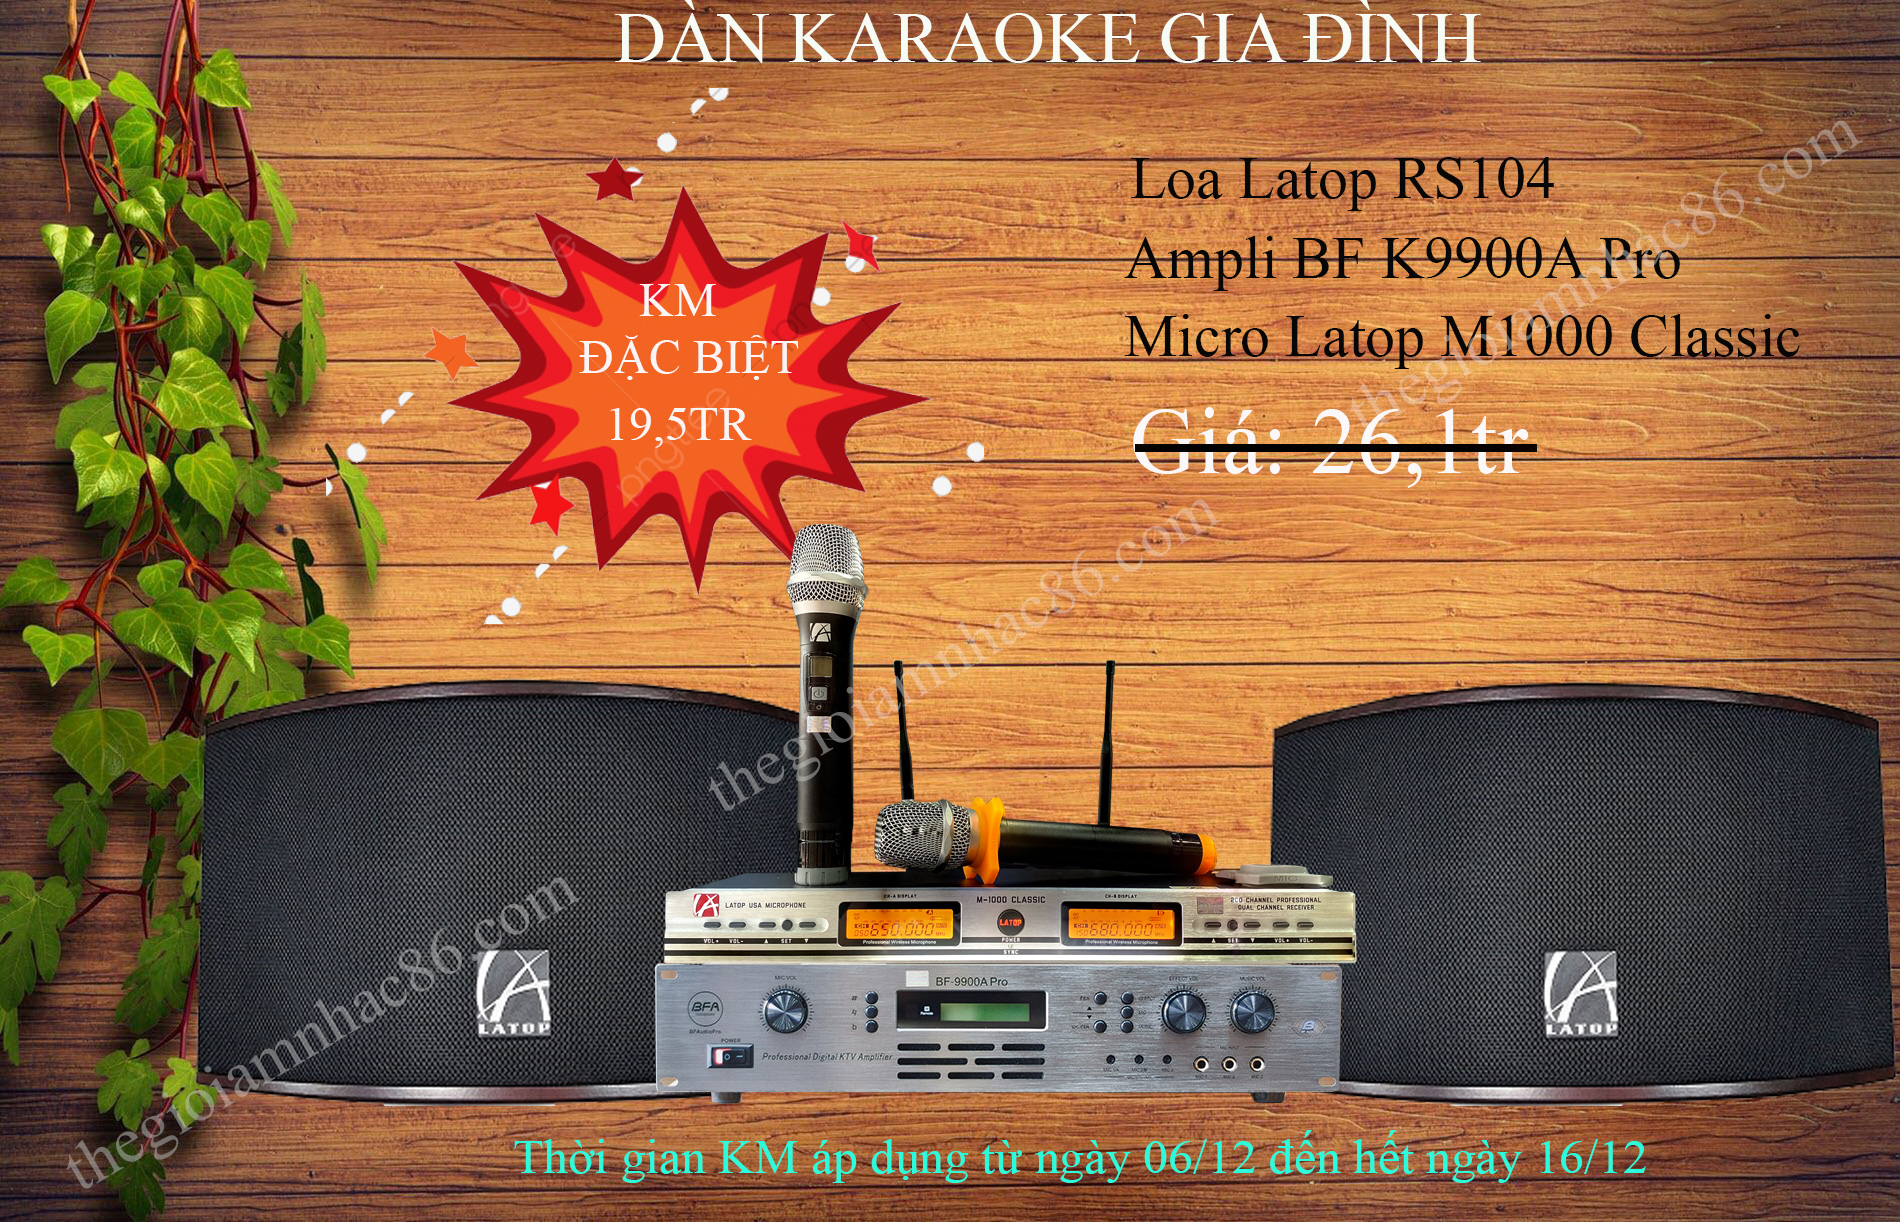 Dan karaoke gia dinh mới nhất năm 2020